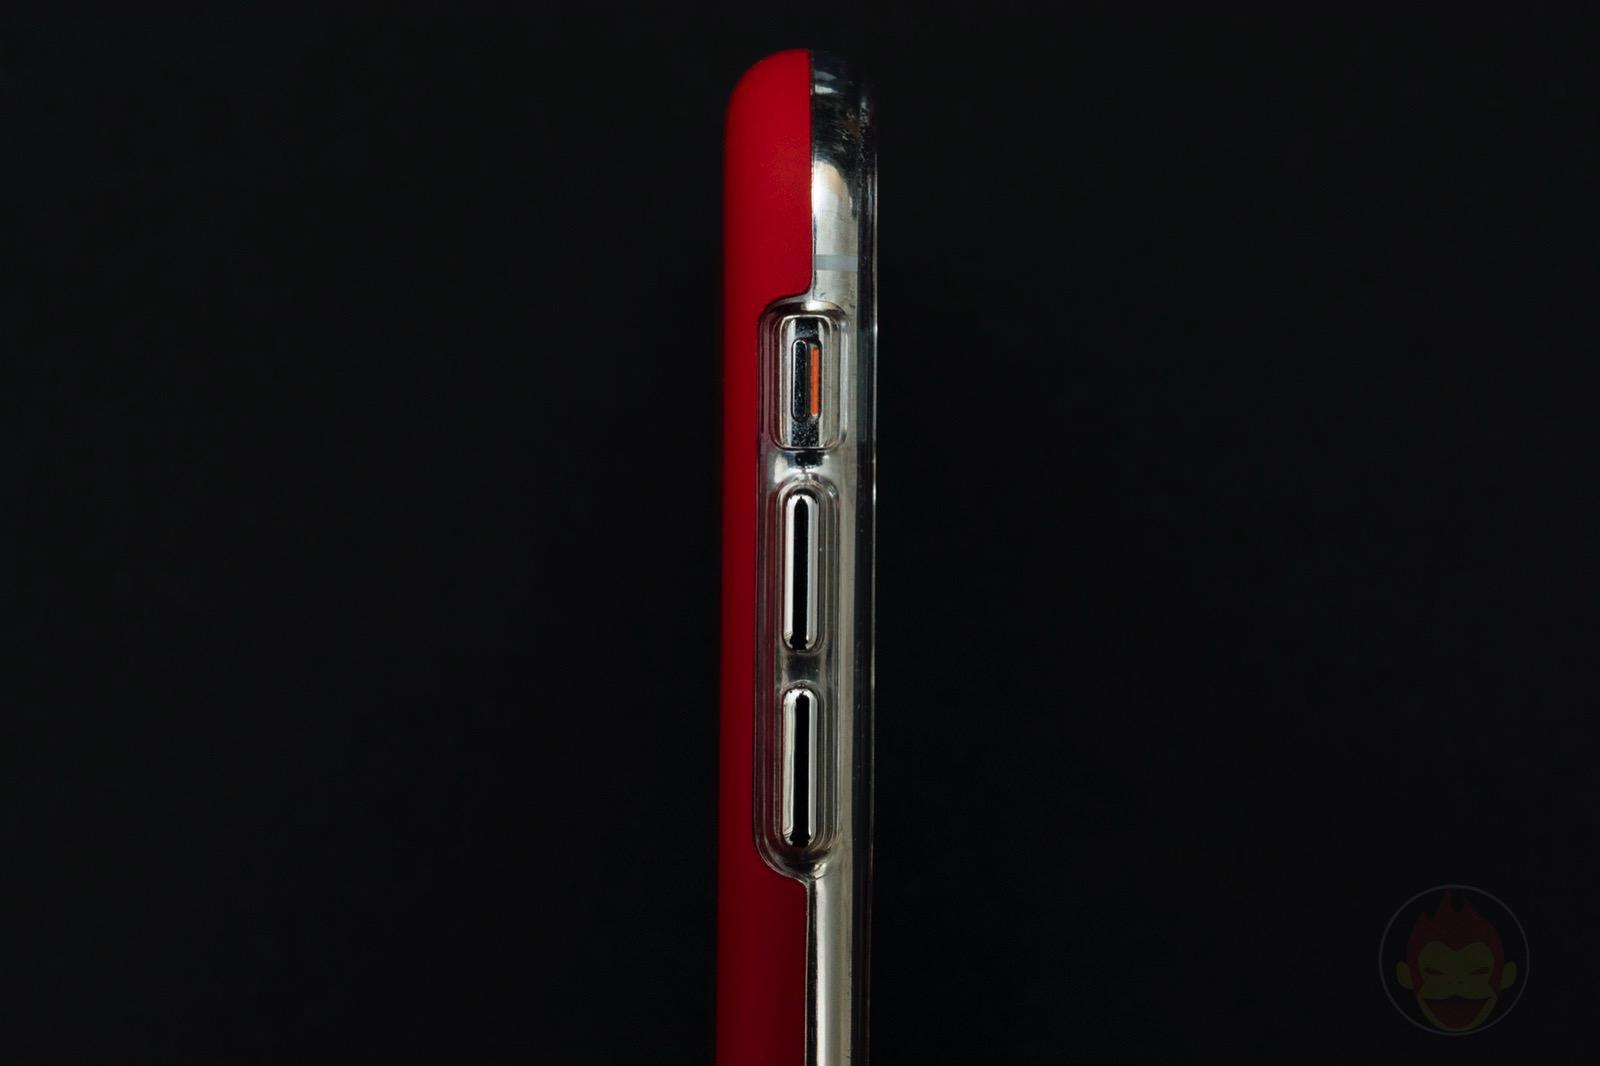 PhoneFoam-Dual-Skin-iPhoneX-Case-07.jpg